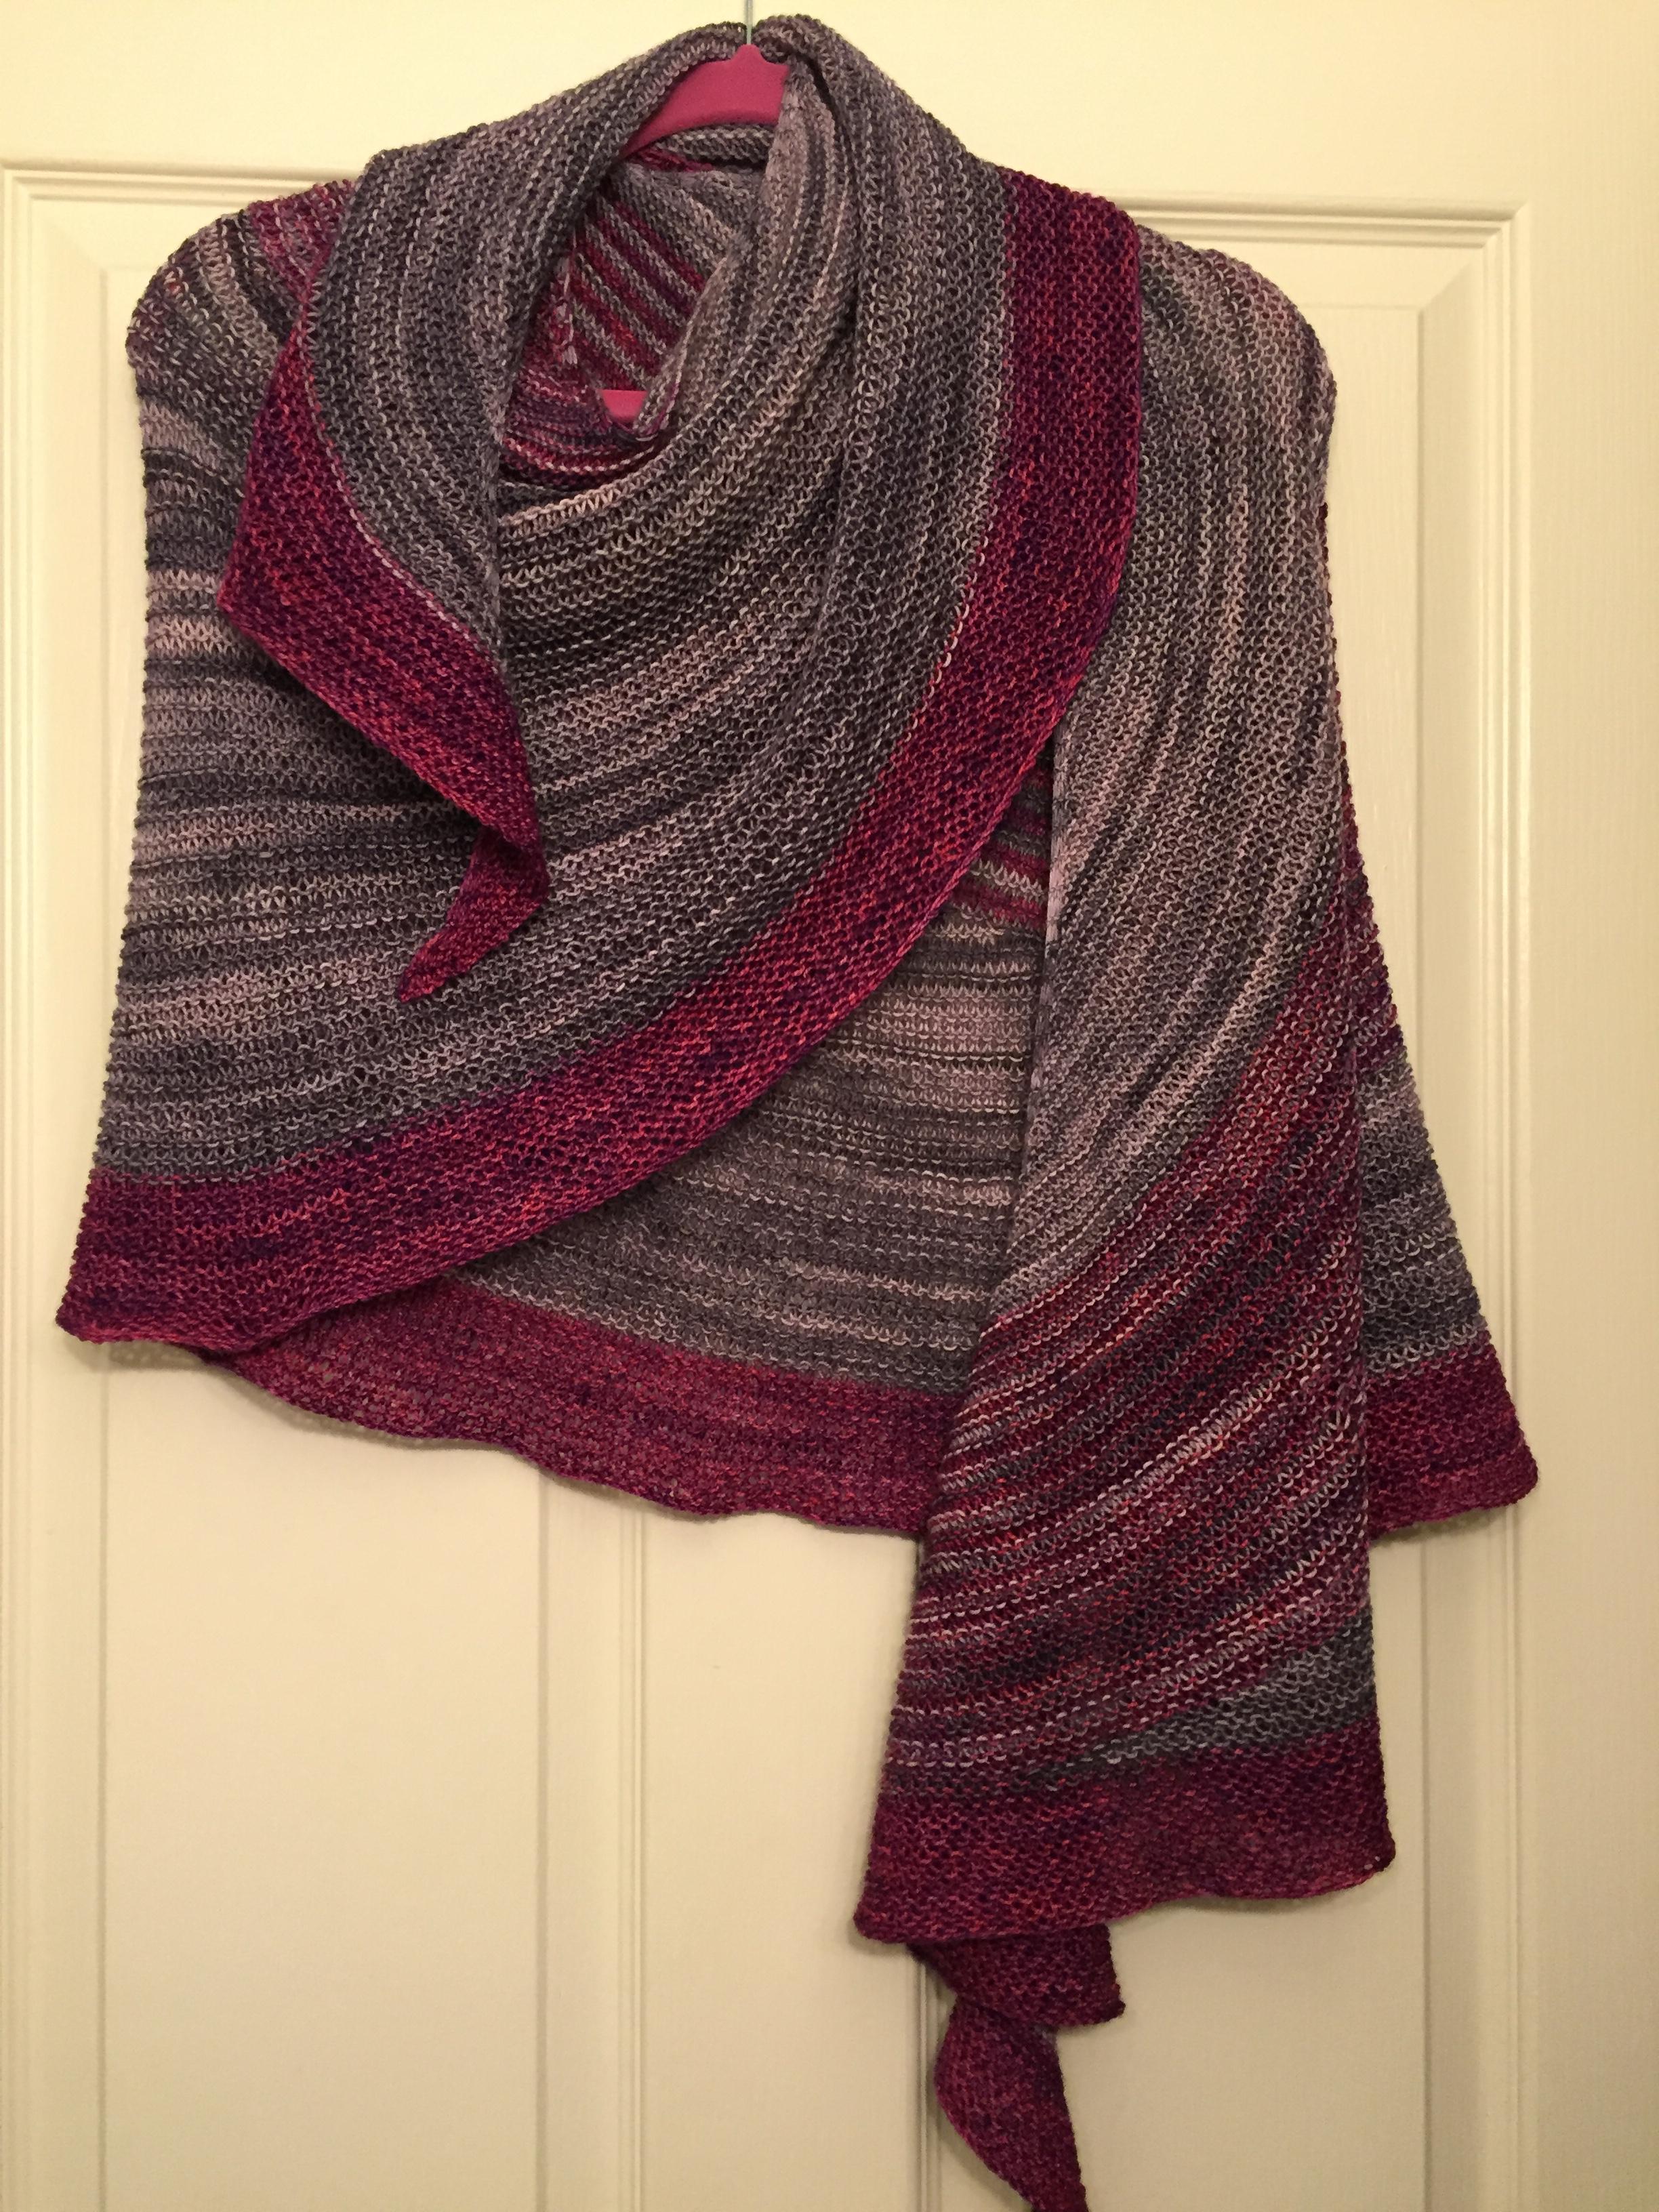 theneedlebee shawl